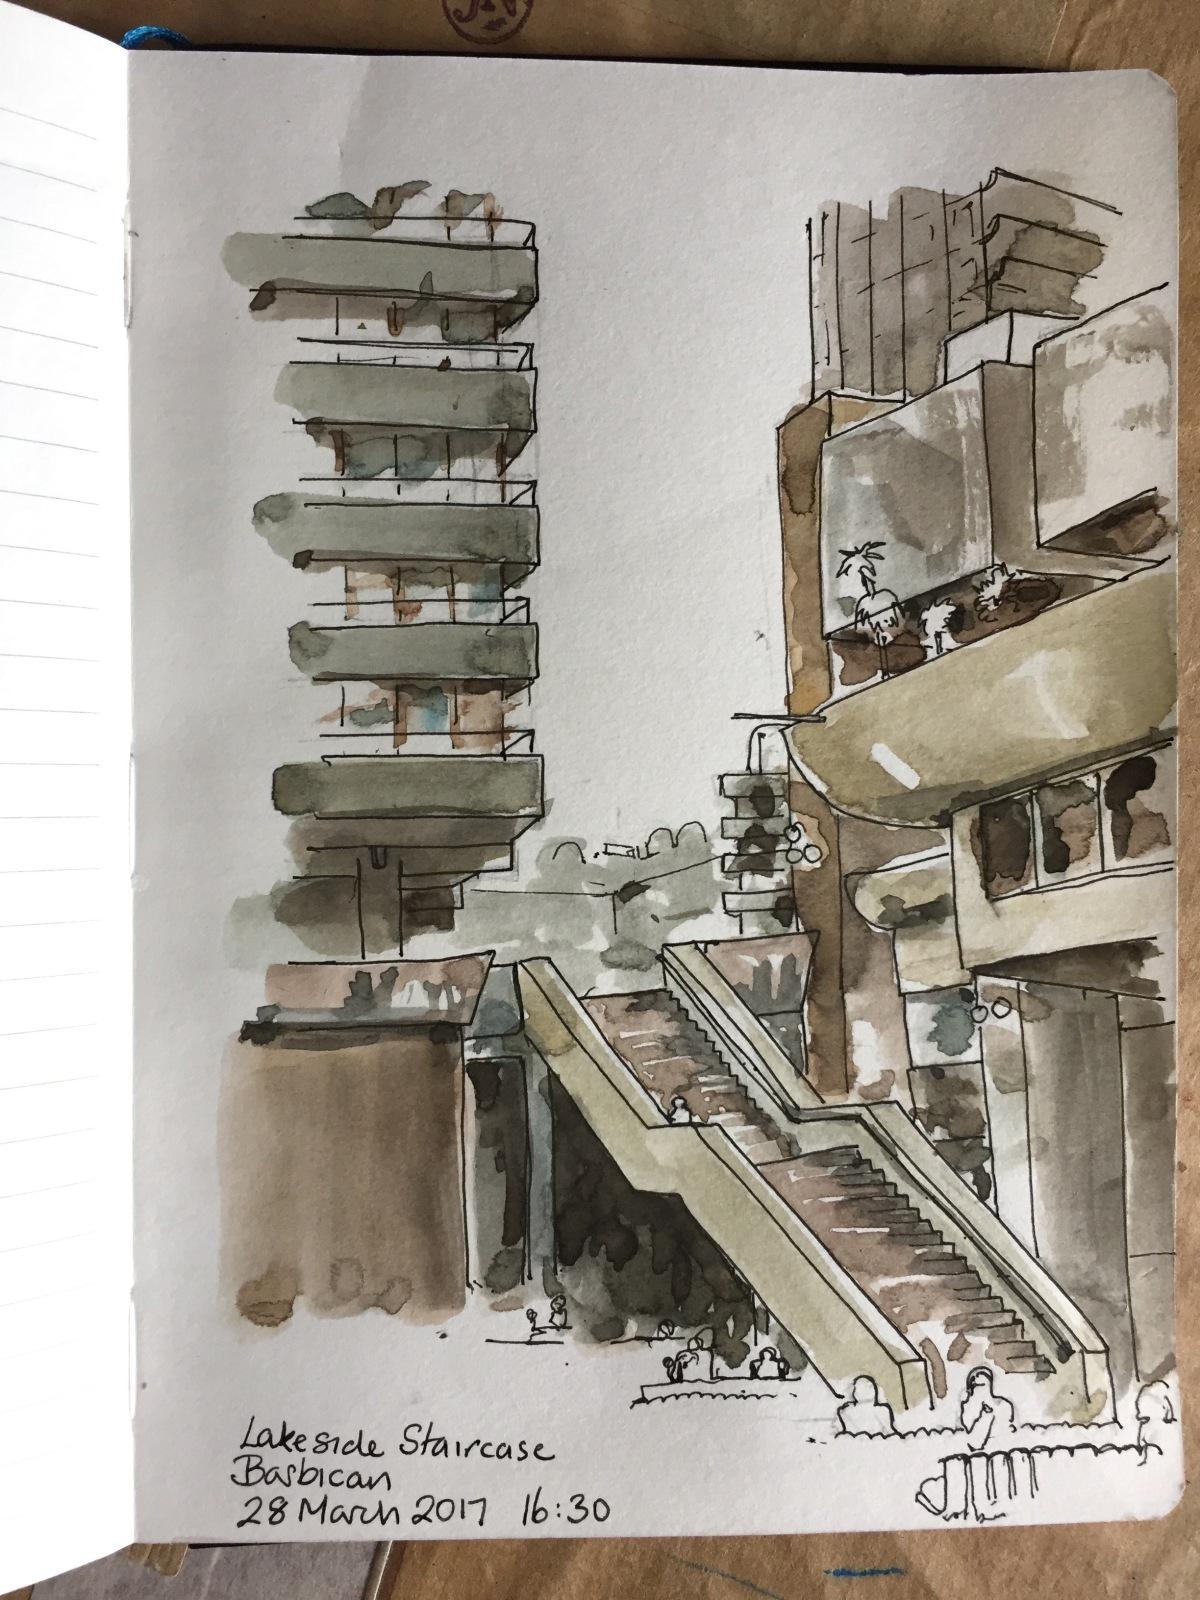 Barbican Staircase